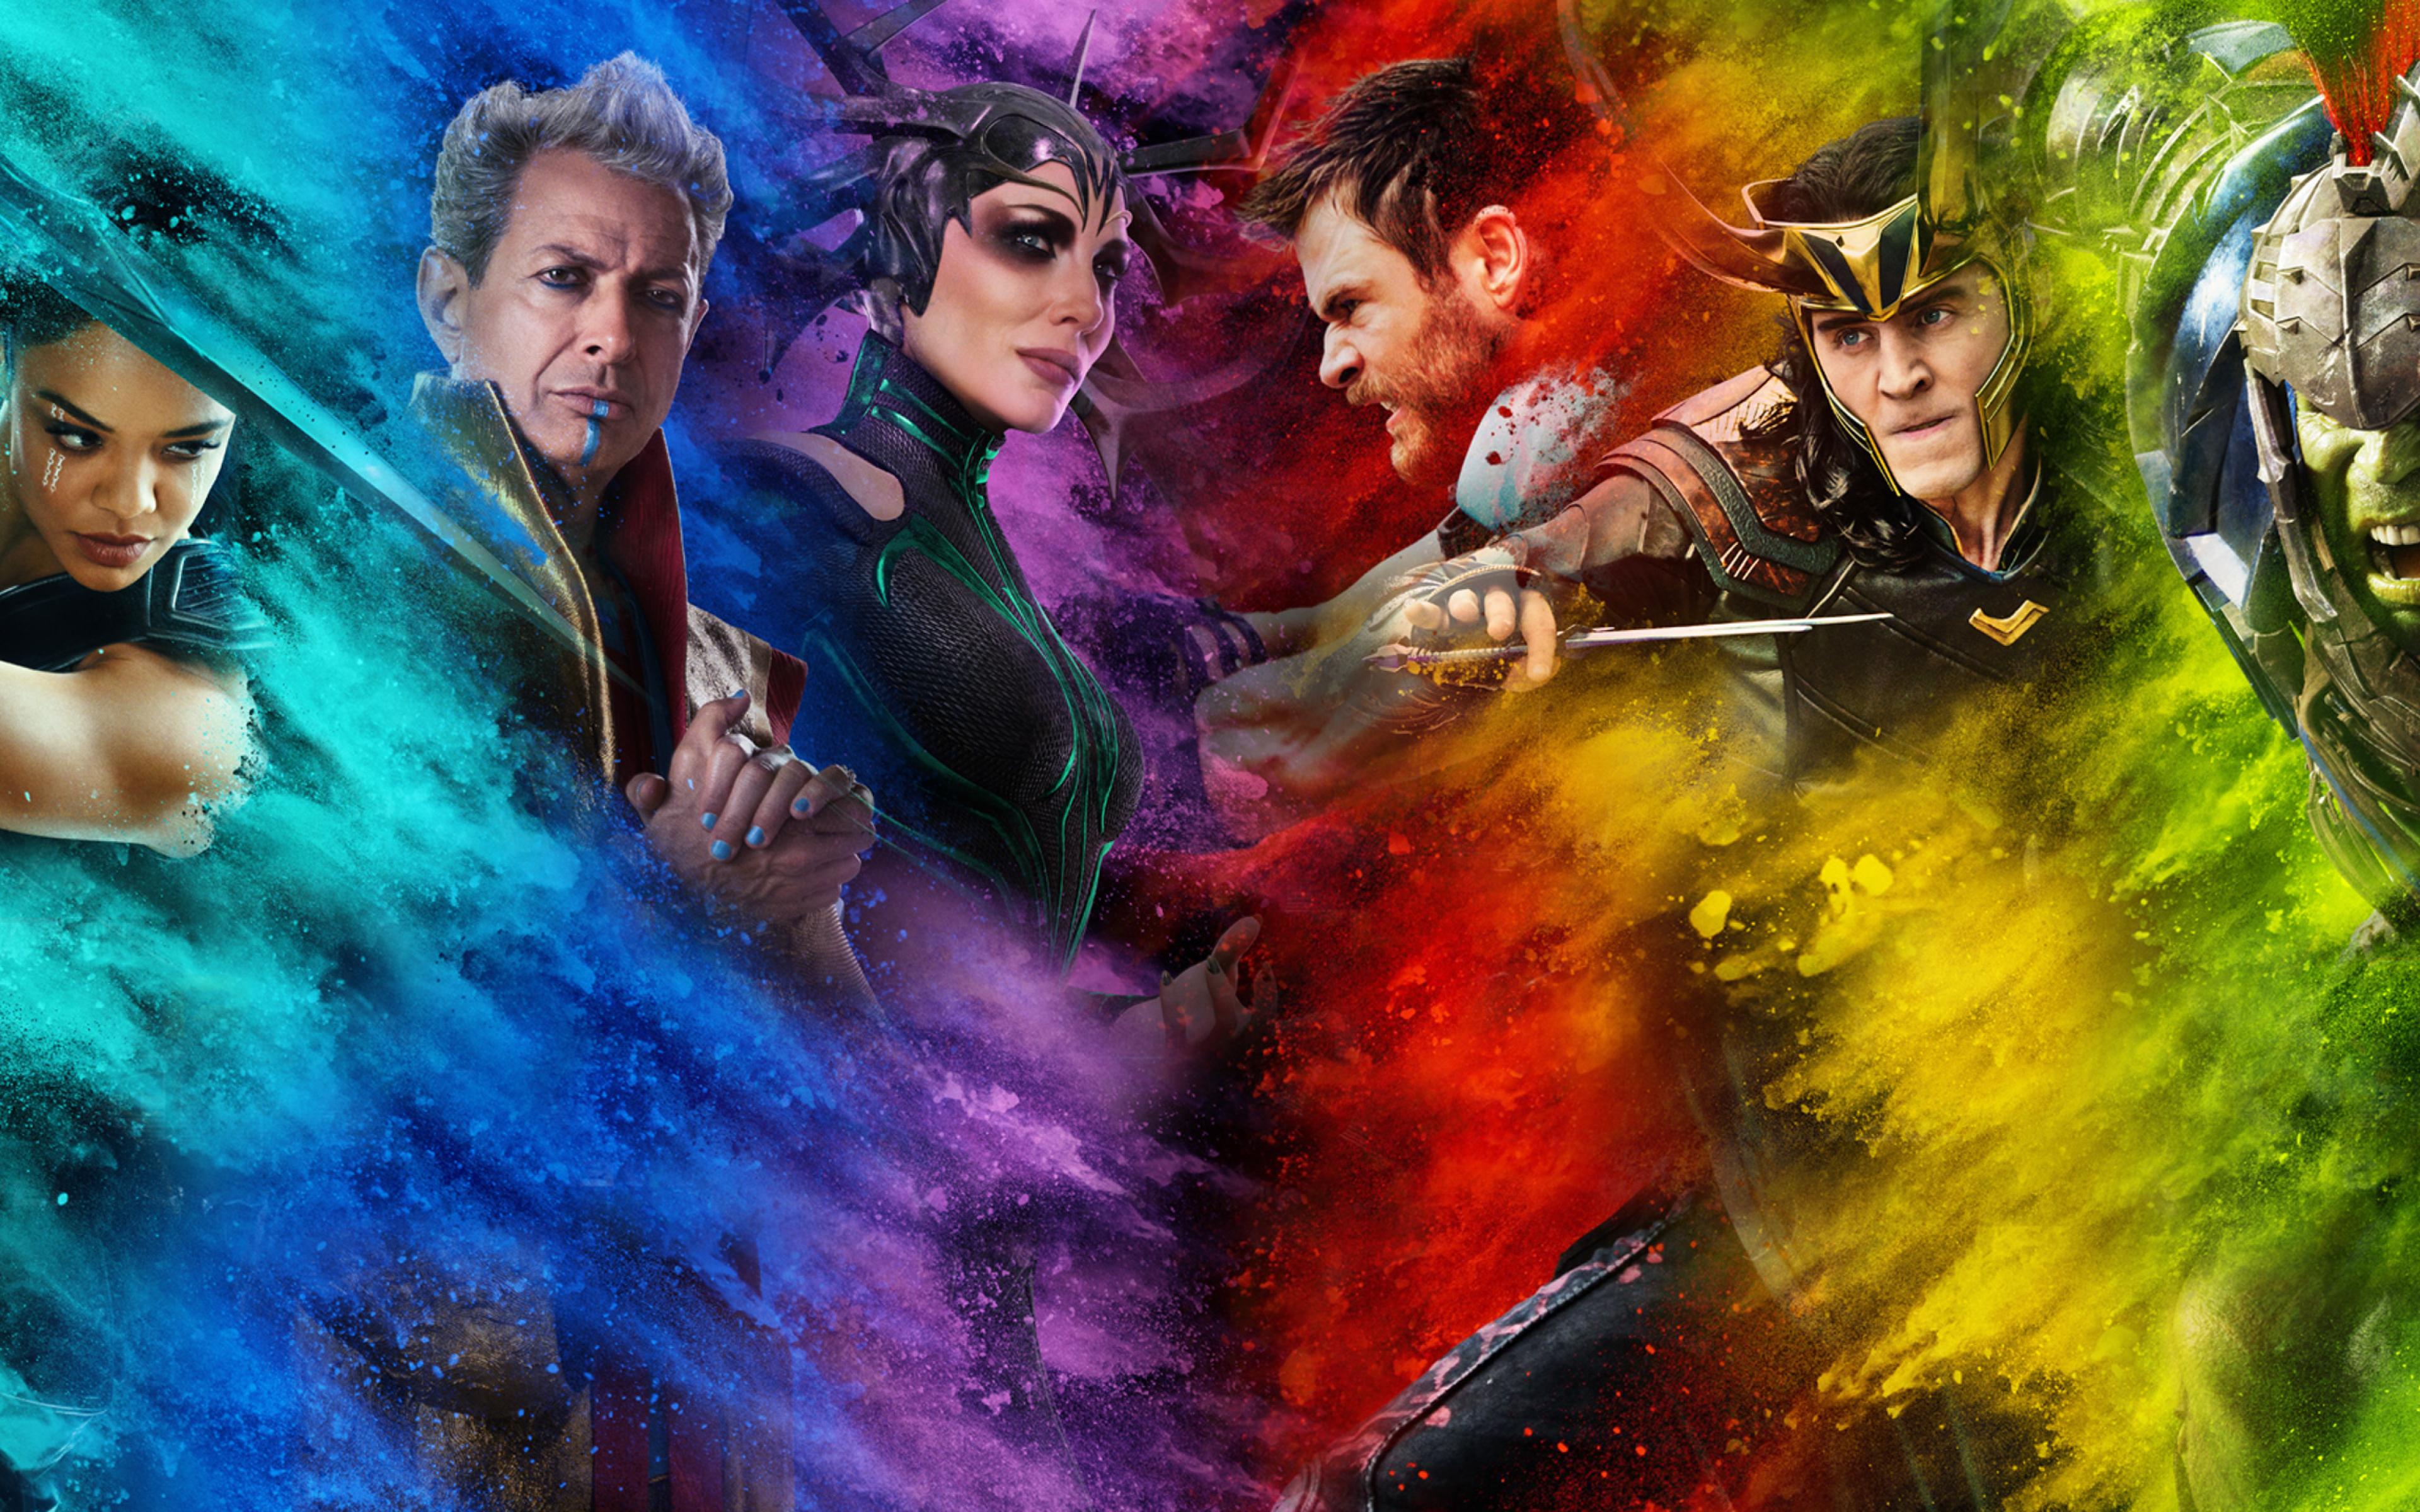 Thor Ragnarok Poster, Full HD 2K Wallpaper